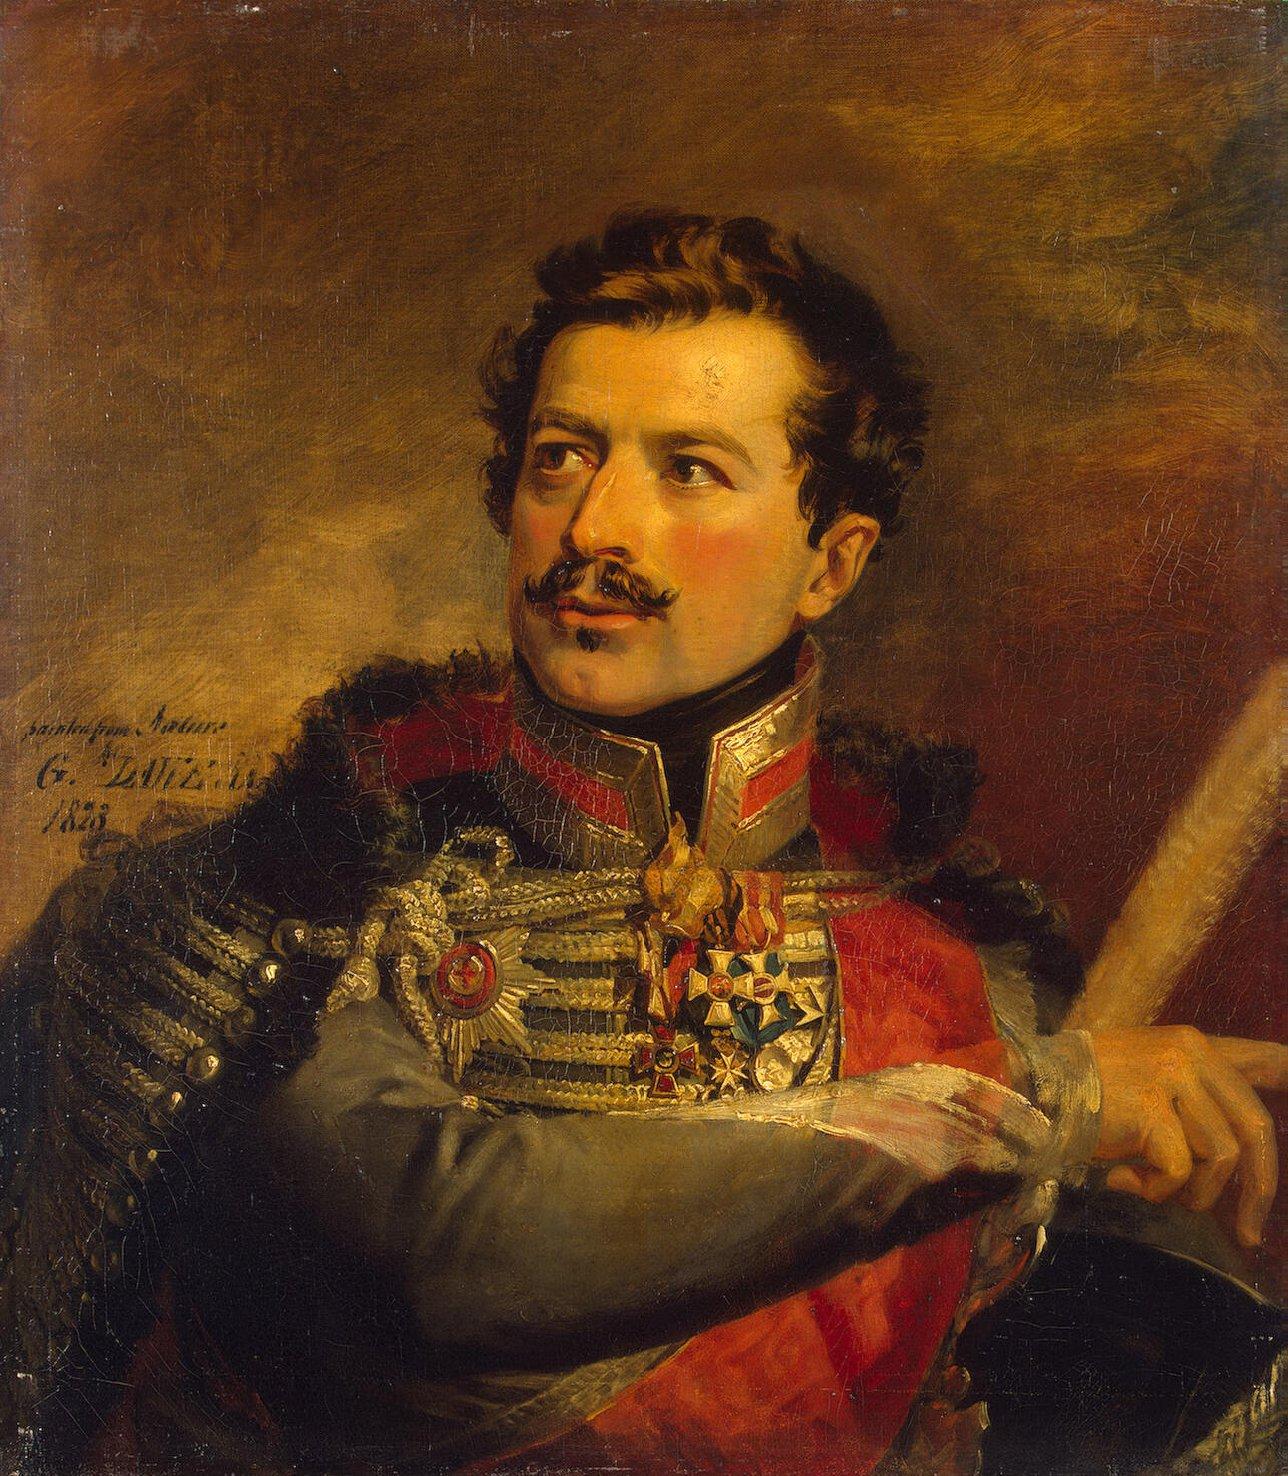 Сеславин, Александр Никитич